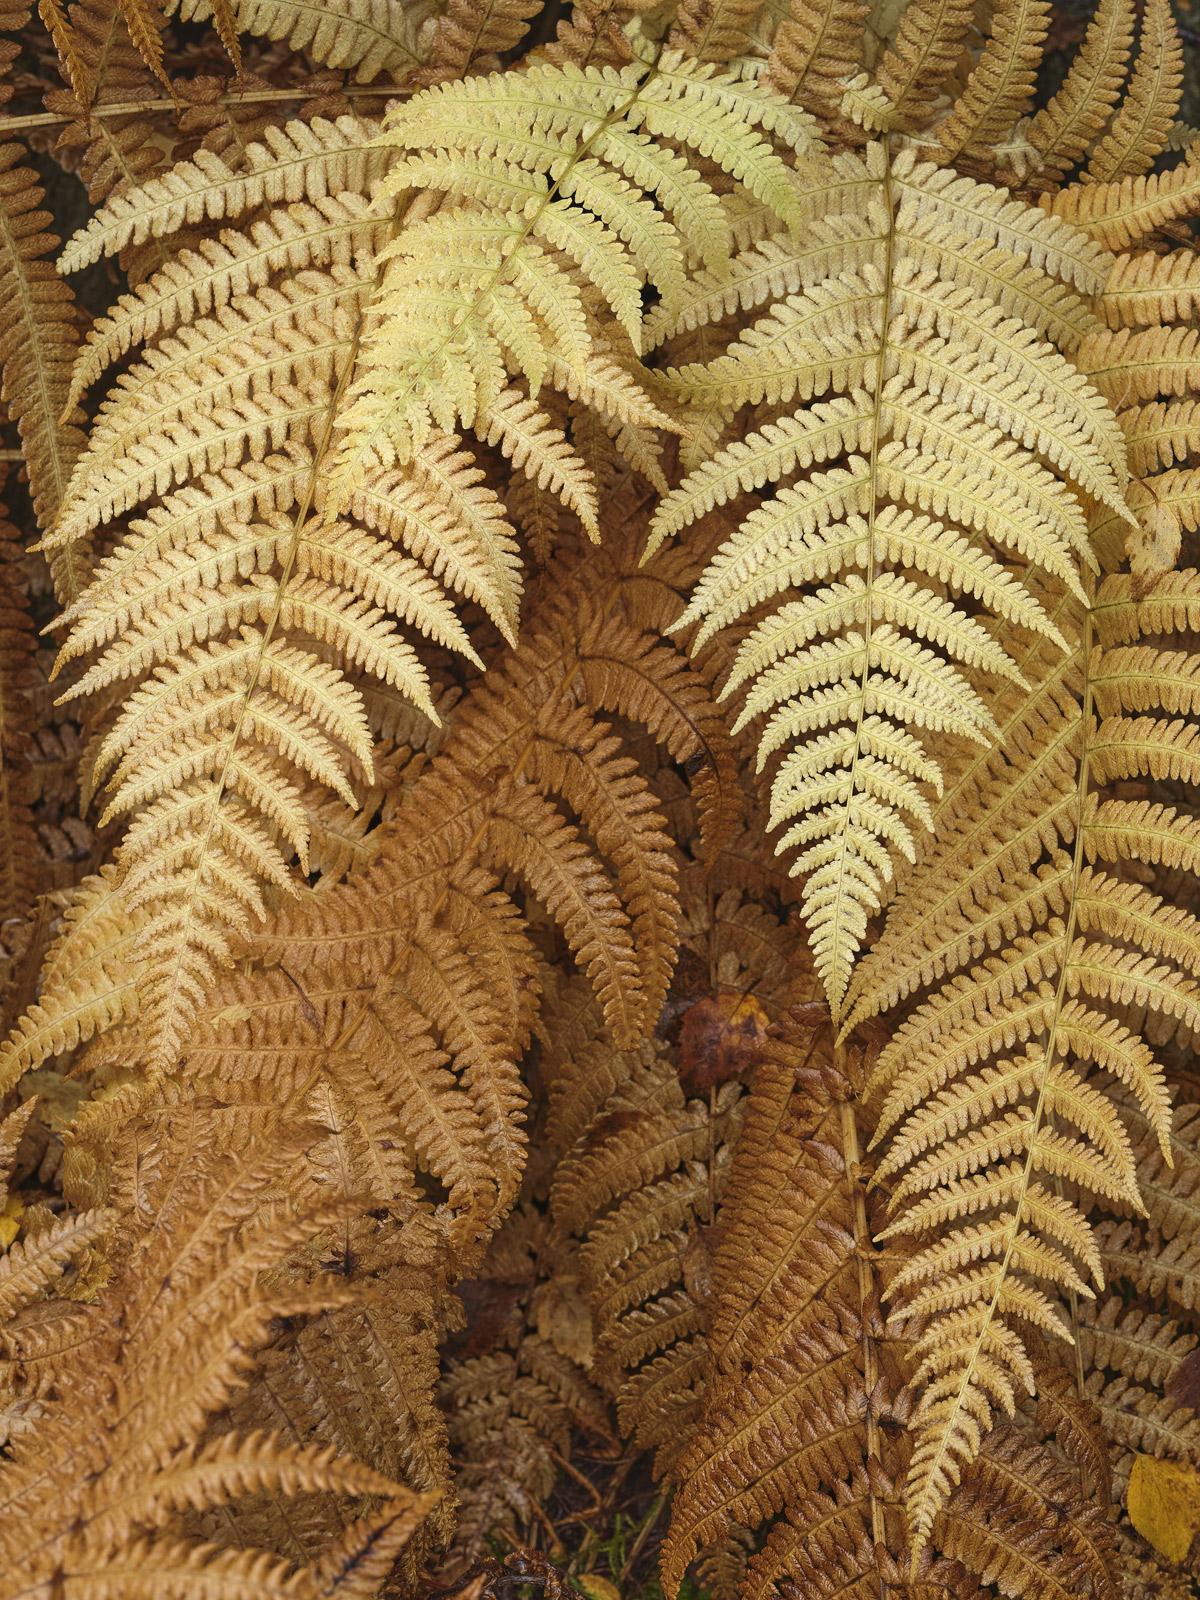 Phase Change Ferns, Glen Affric, Highlands, Scotland, natural, stone, wall, delicate, nutrient, elegant, sheltered, loam, photo